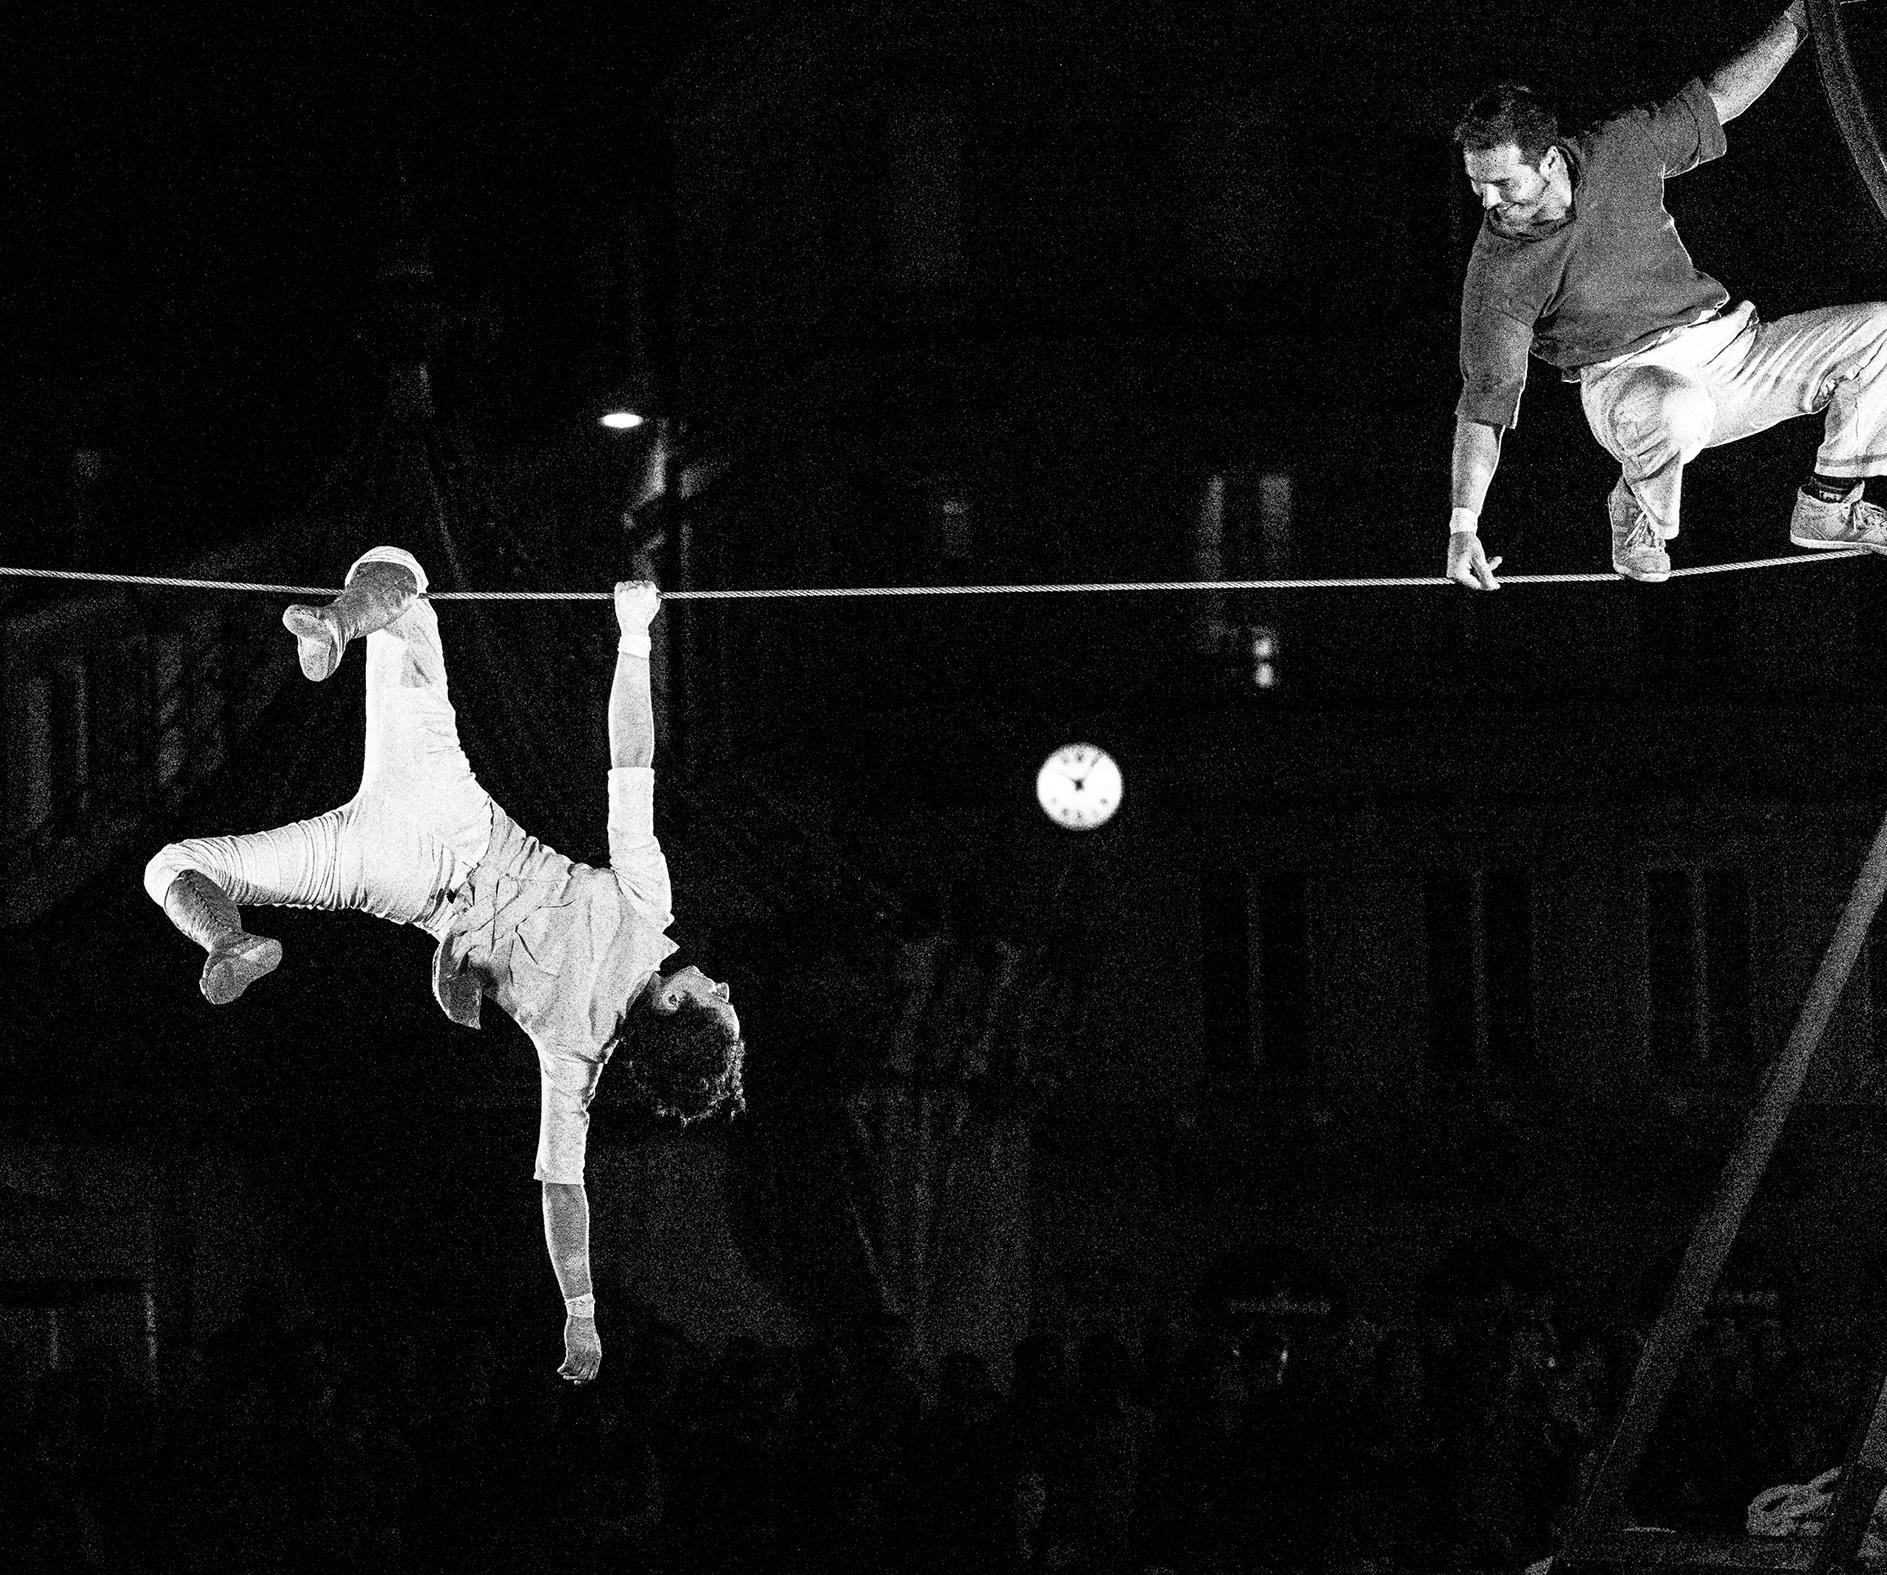 spectacles-sodade-cirque-rouage-mirabelle-metz-2015-marie-colette-becker-15